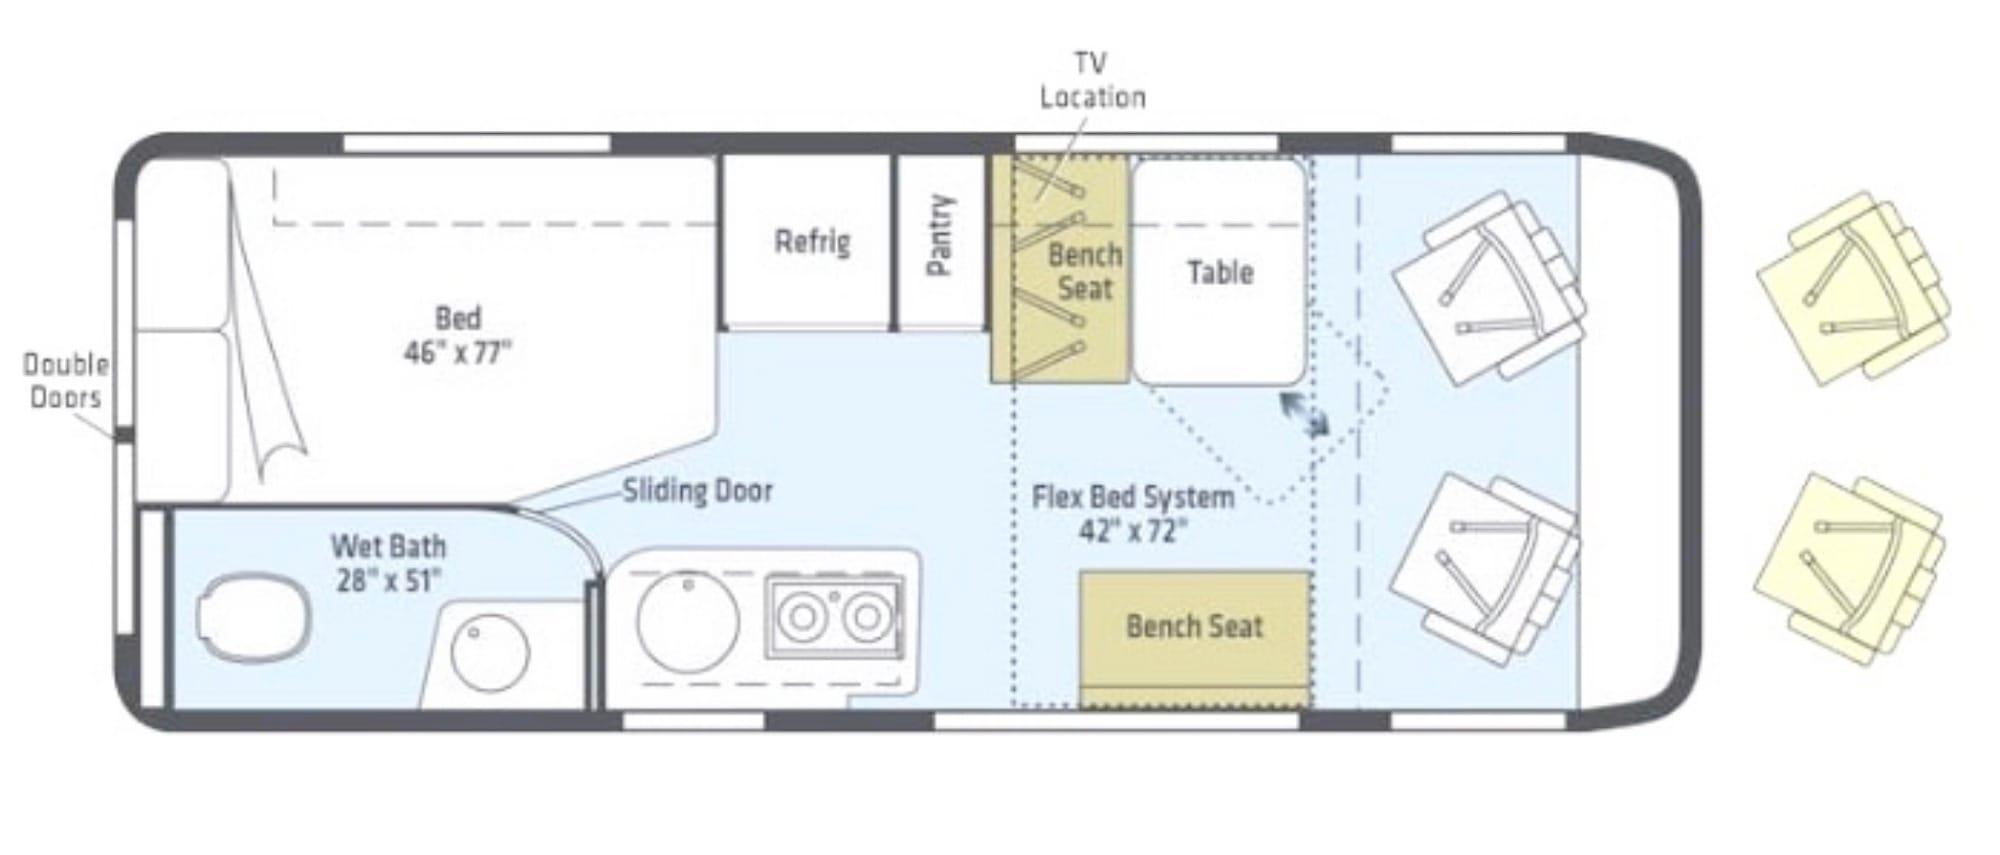 Floorplan from Winnebago. Winnebago Travato 2020